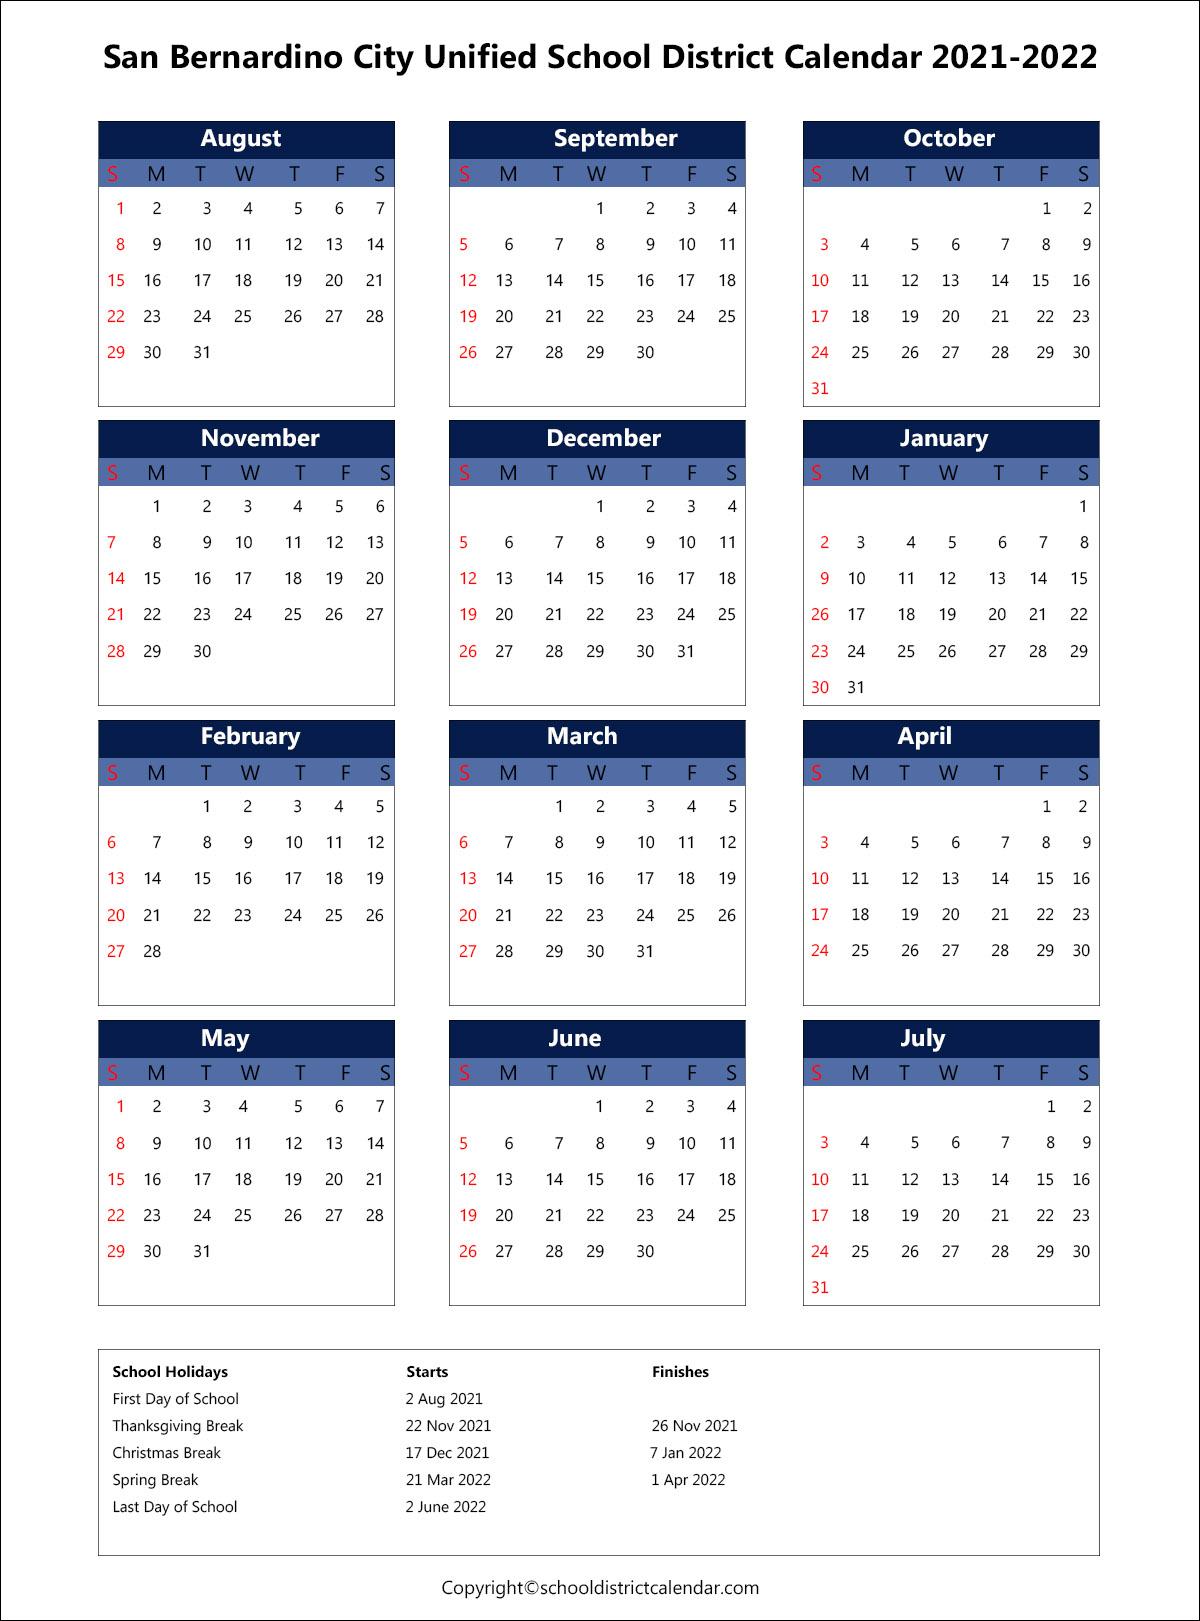 San Bernardino City Unified School District Calendar 2021